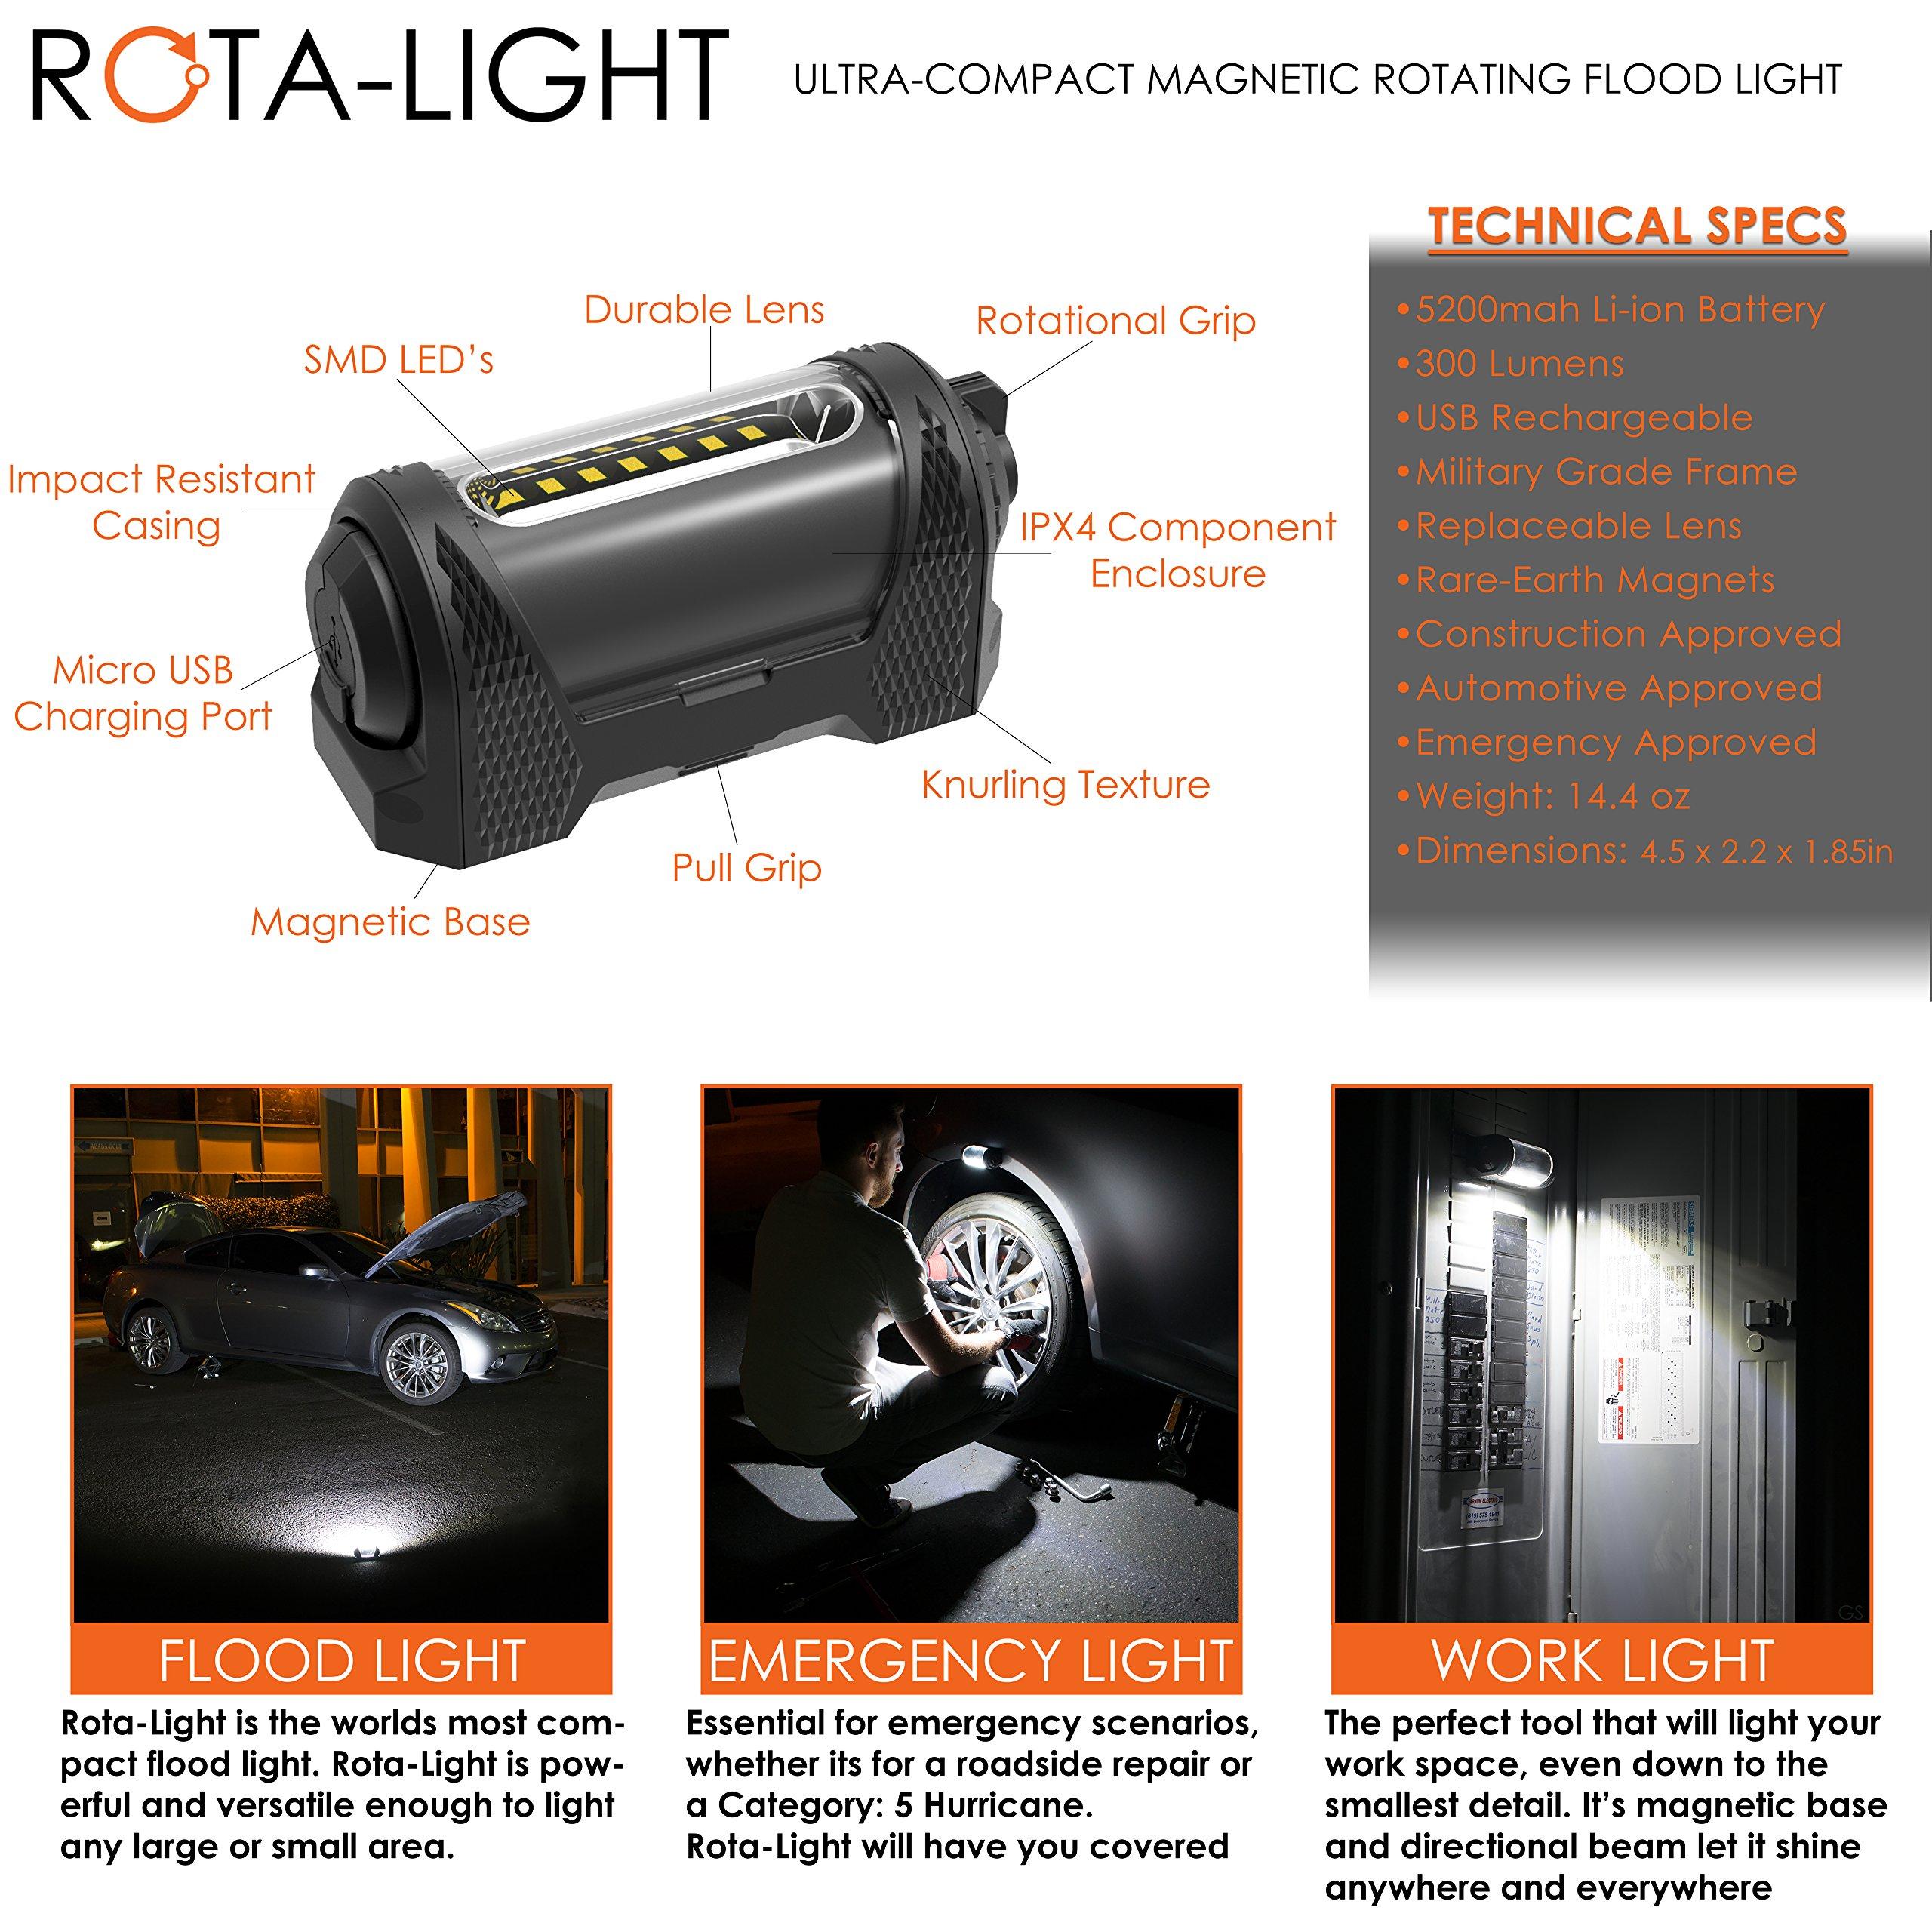 Rota-Light - Premium Magnetic Work Light w/ 9-Hour Battery Life by ROTA-LIGHT (Image #2)